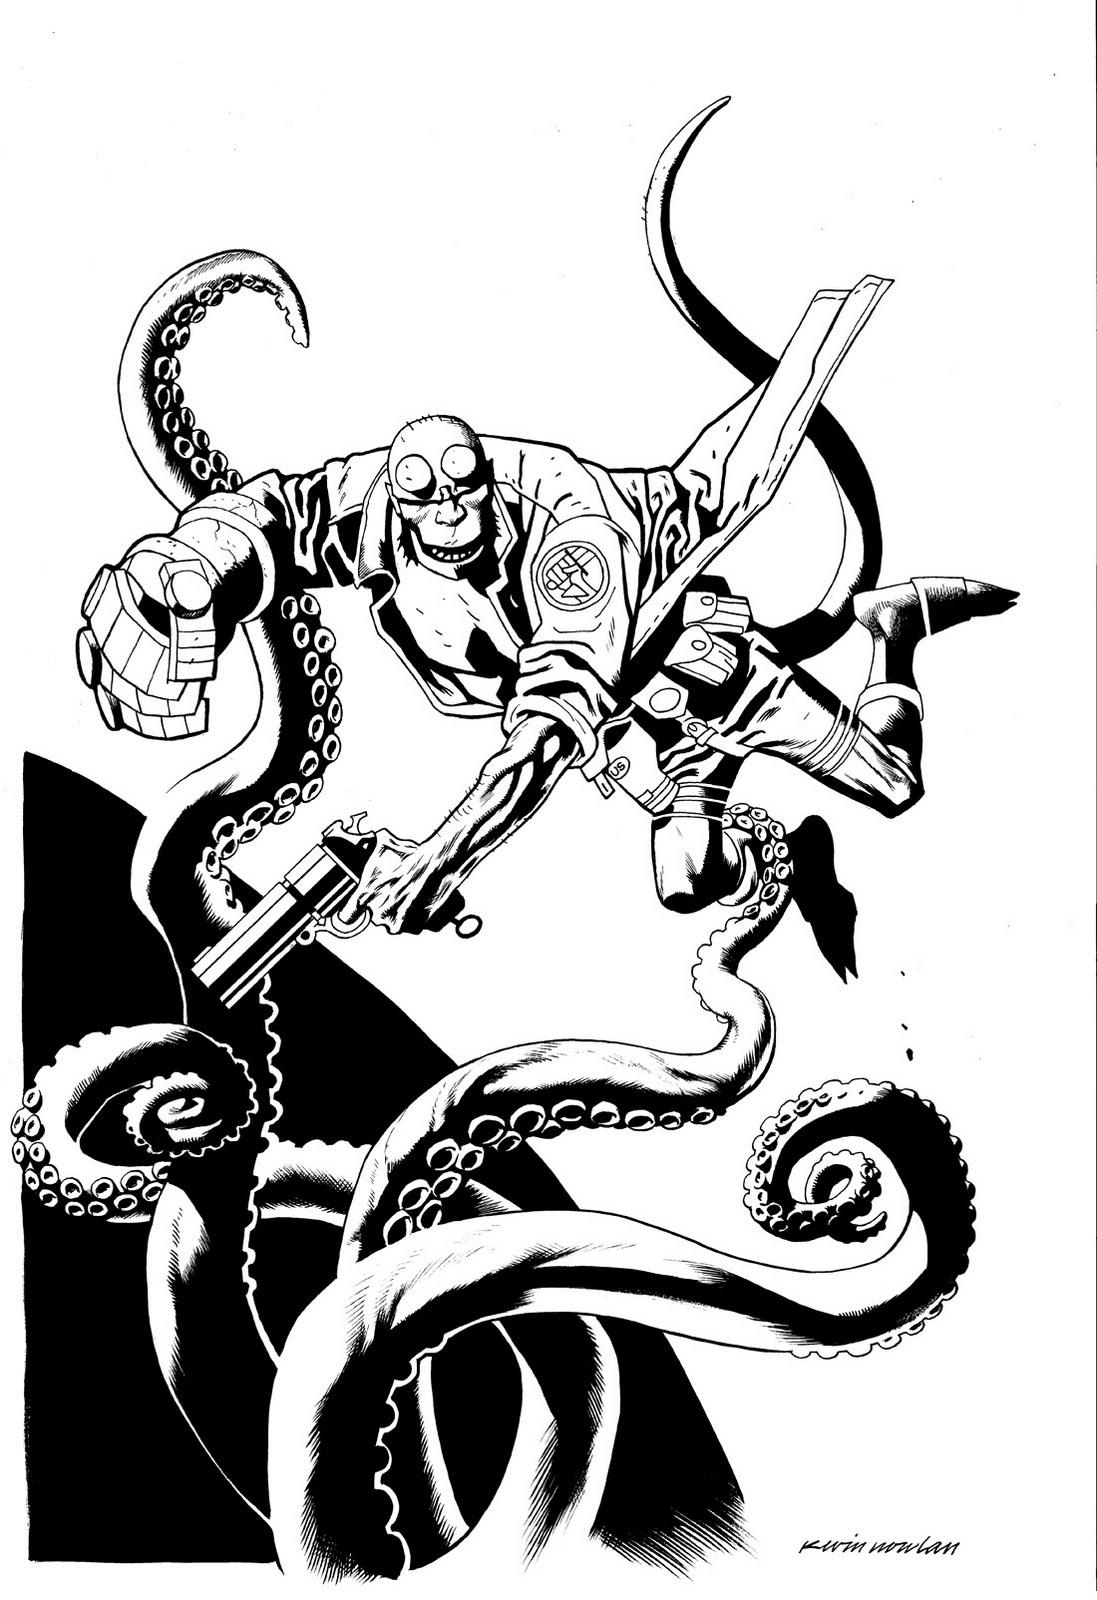 Coloring Pages Hellboy Coloring Pages hellboy coloring pages eassume com kevin nowlan hellboy